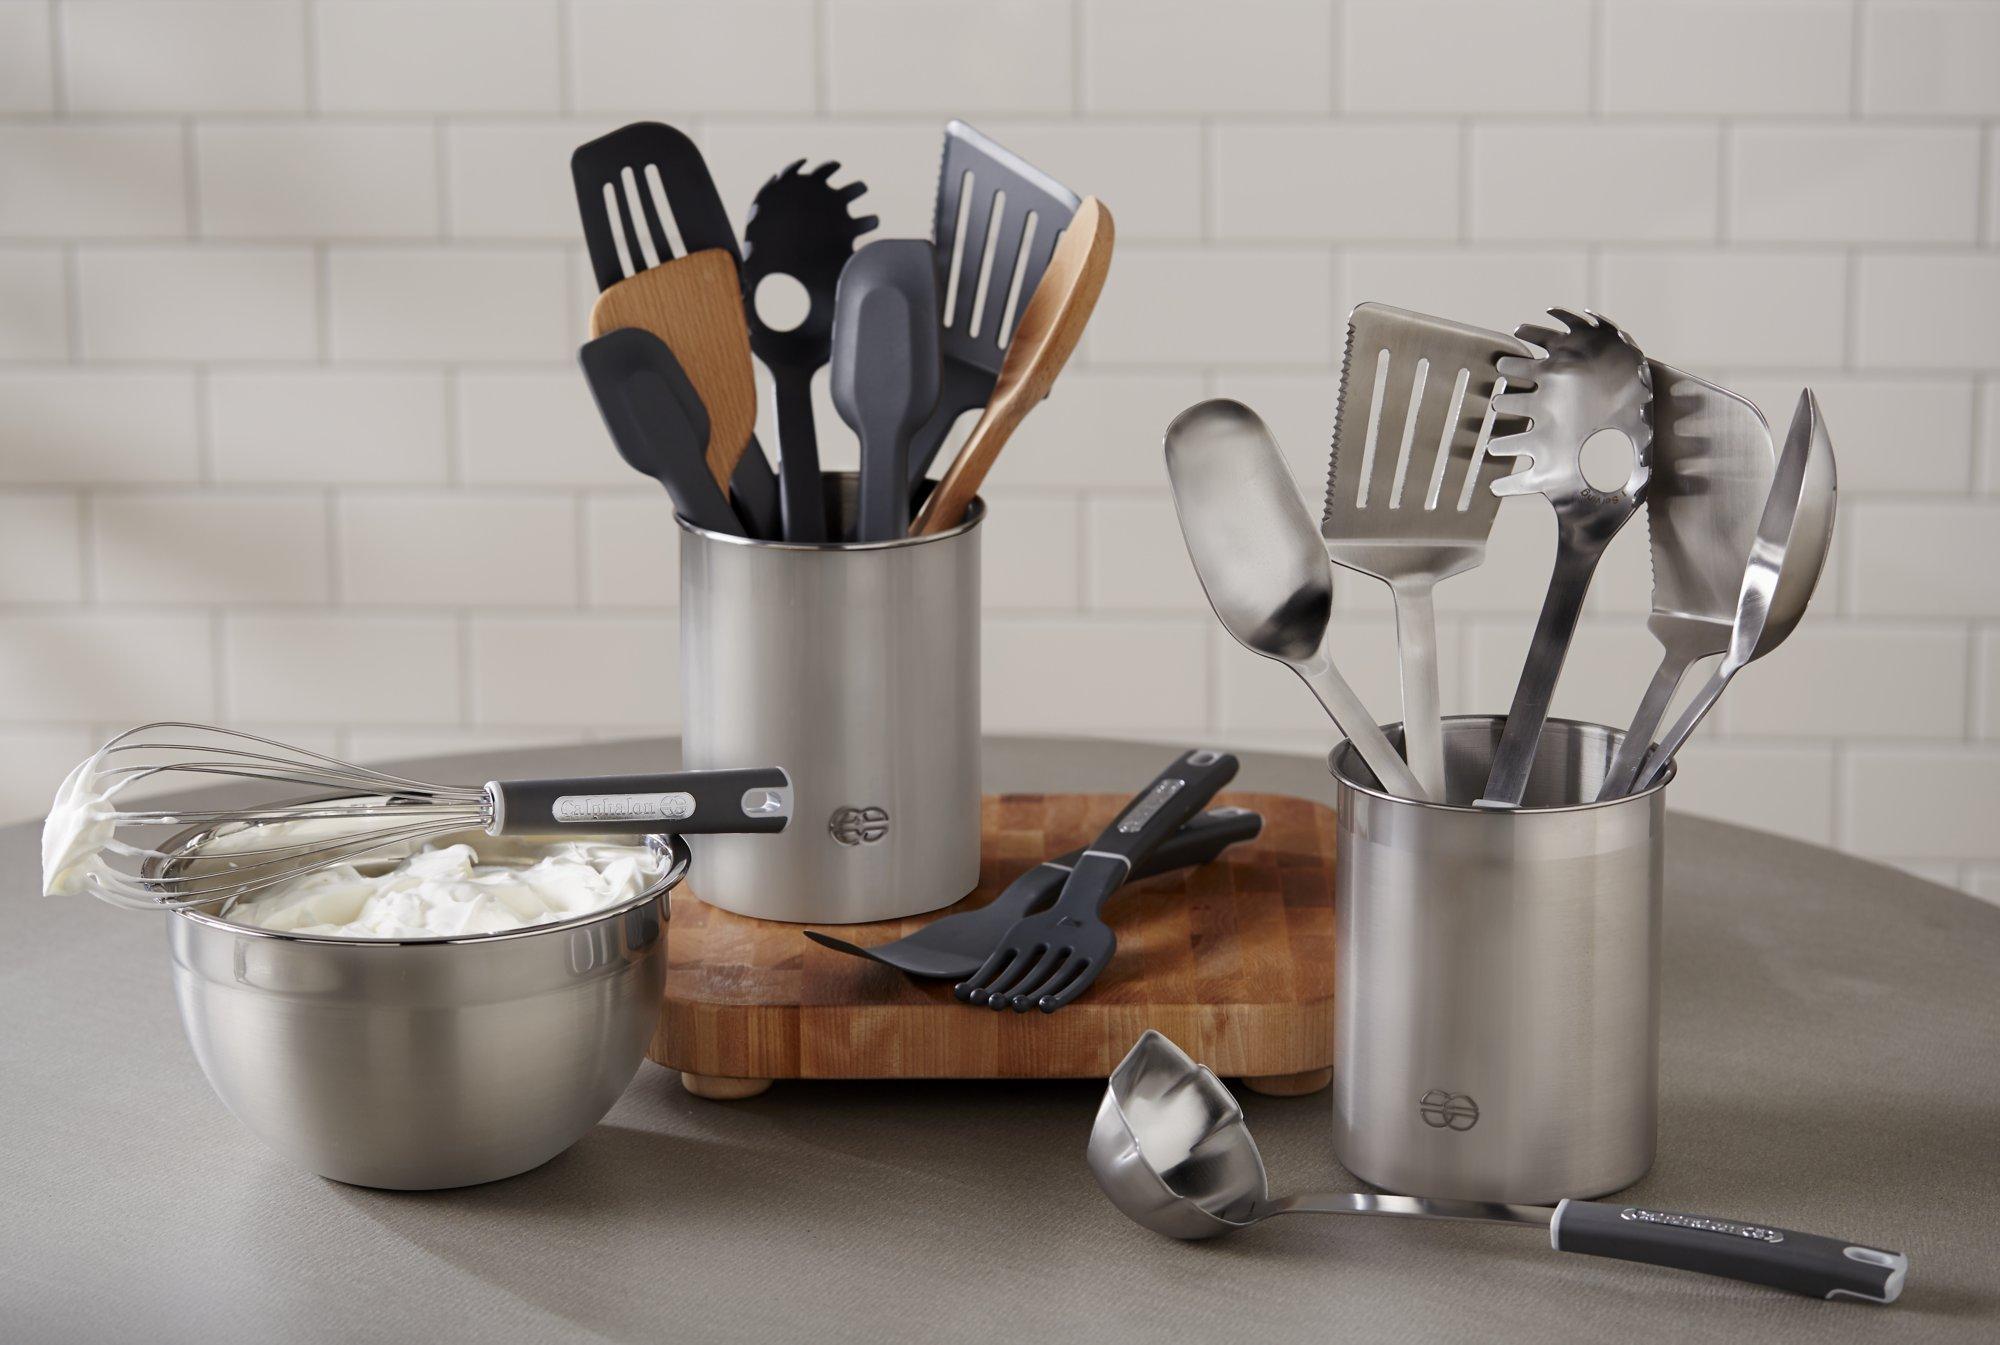 calphalon kitchen essentials sink repair cookware cutlery bakeware kitchenware and more